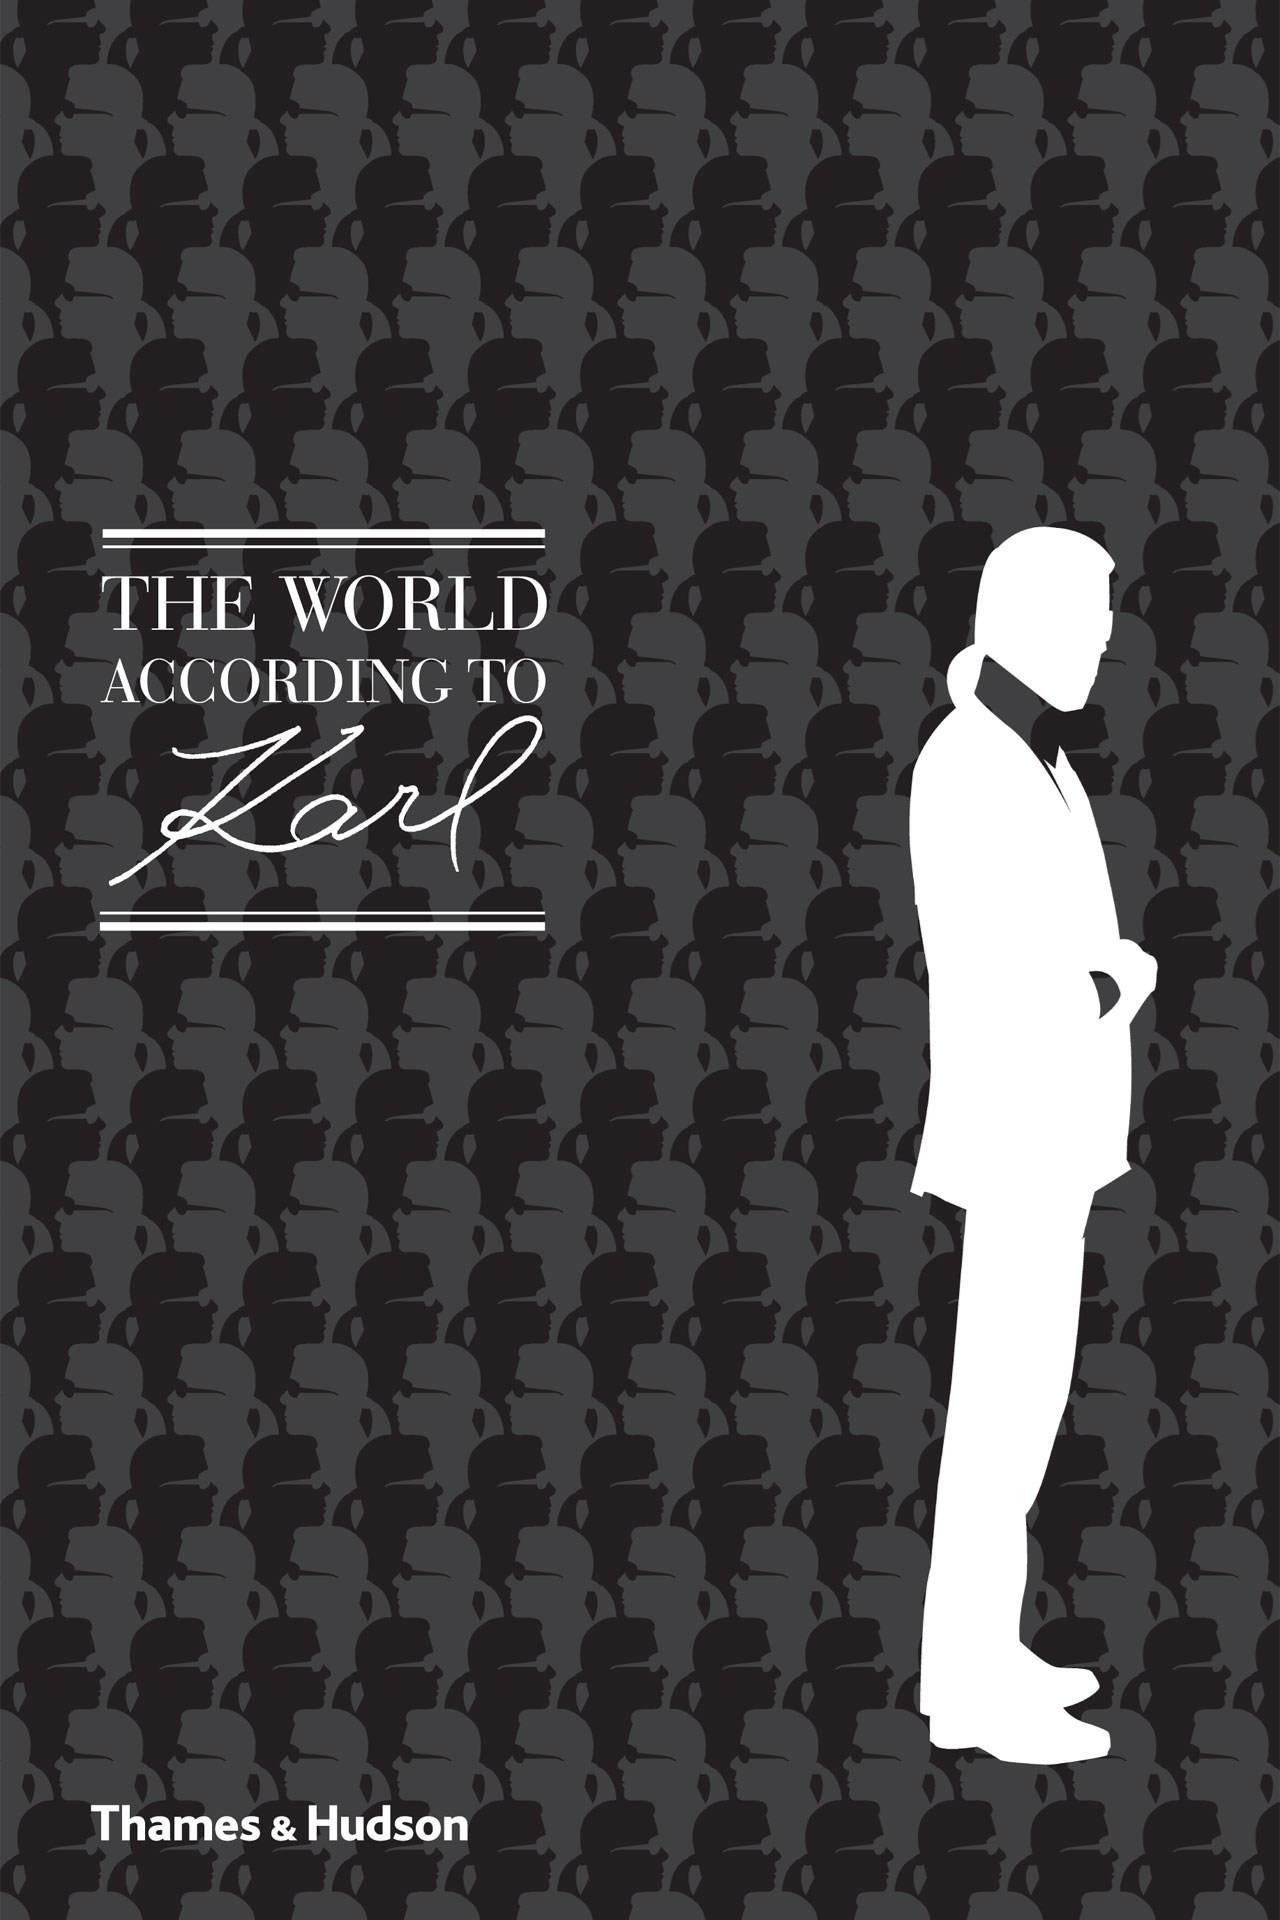 Karl-Book-Cover-vogue-12jun13-pr_b